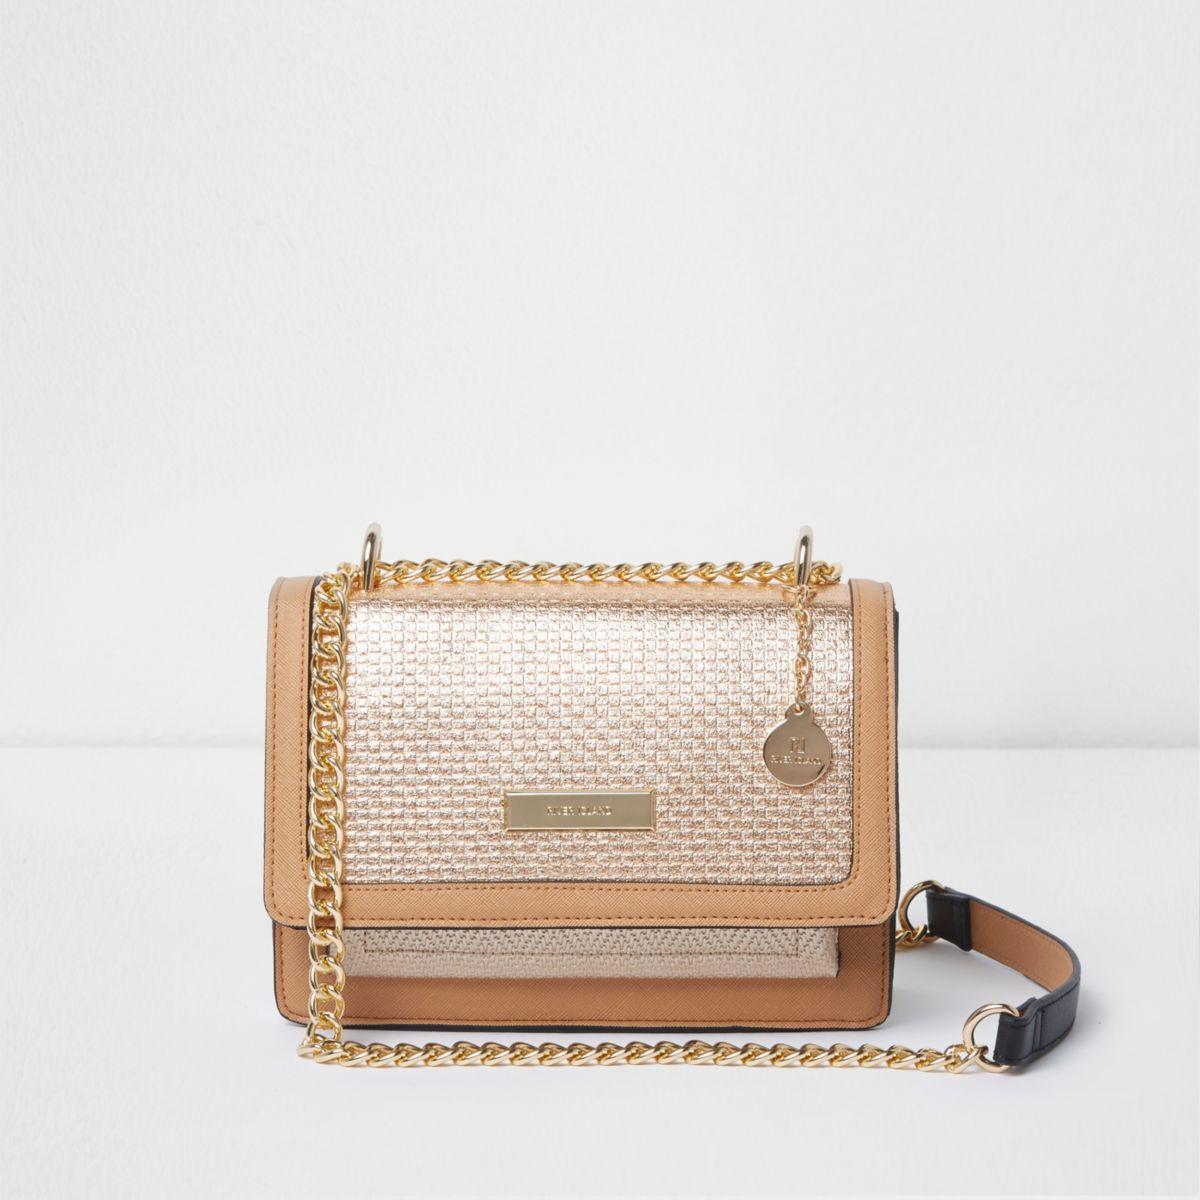 Gold metallic woven cross body chain bag